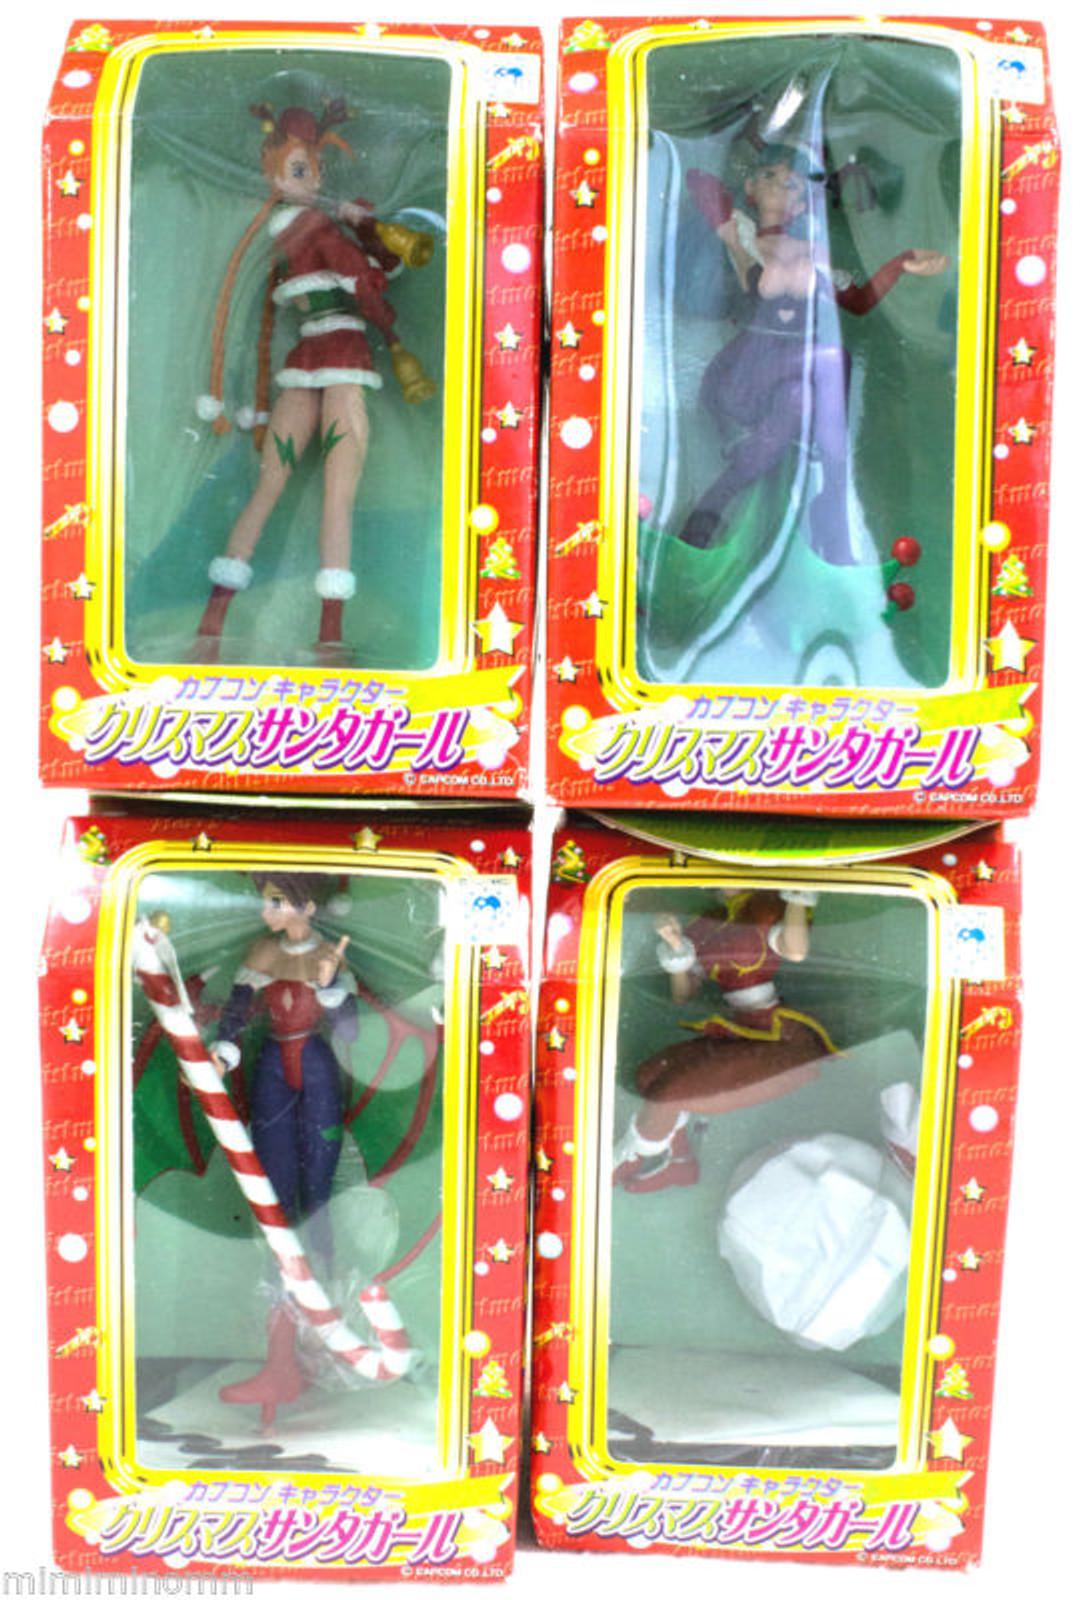 [Set of 4] Street Fighter & Darkstalkers Capcom Christmas Santa Copsplay Figure [Chun-Li / Cammy / Morrigan / Lilith] JAPAN GAME